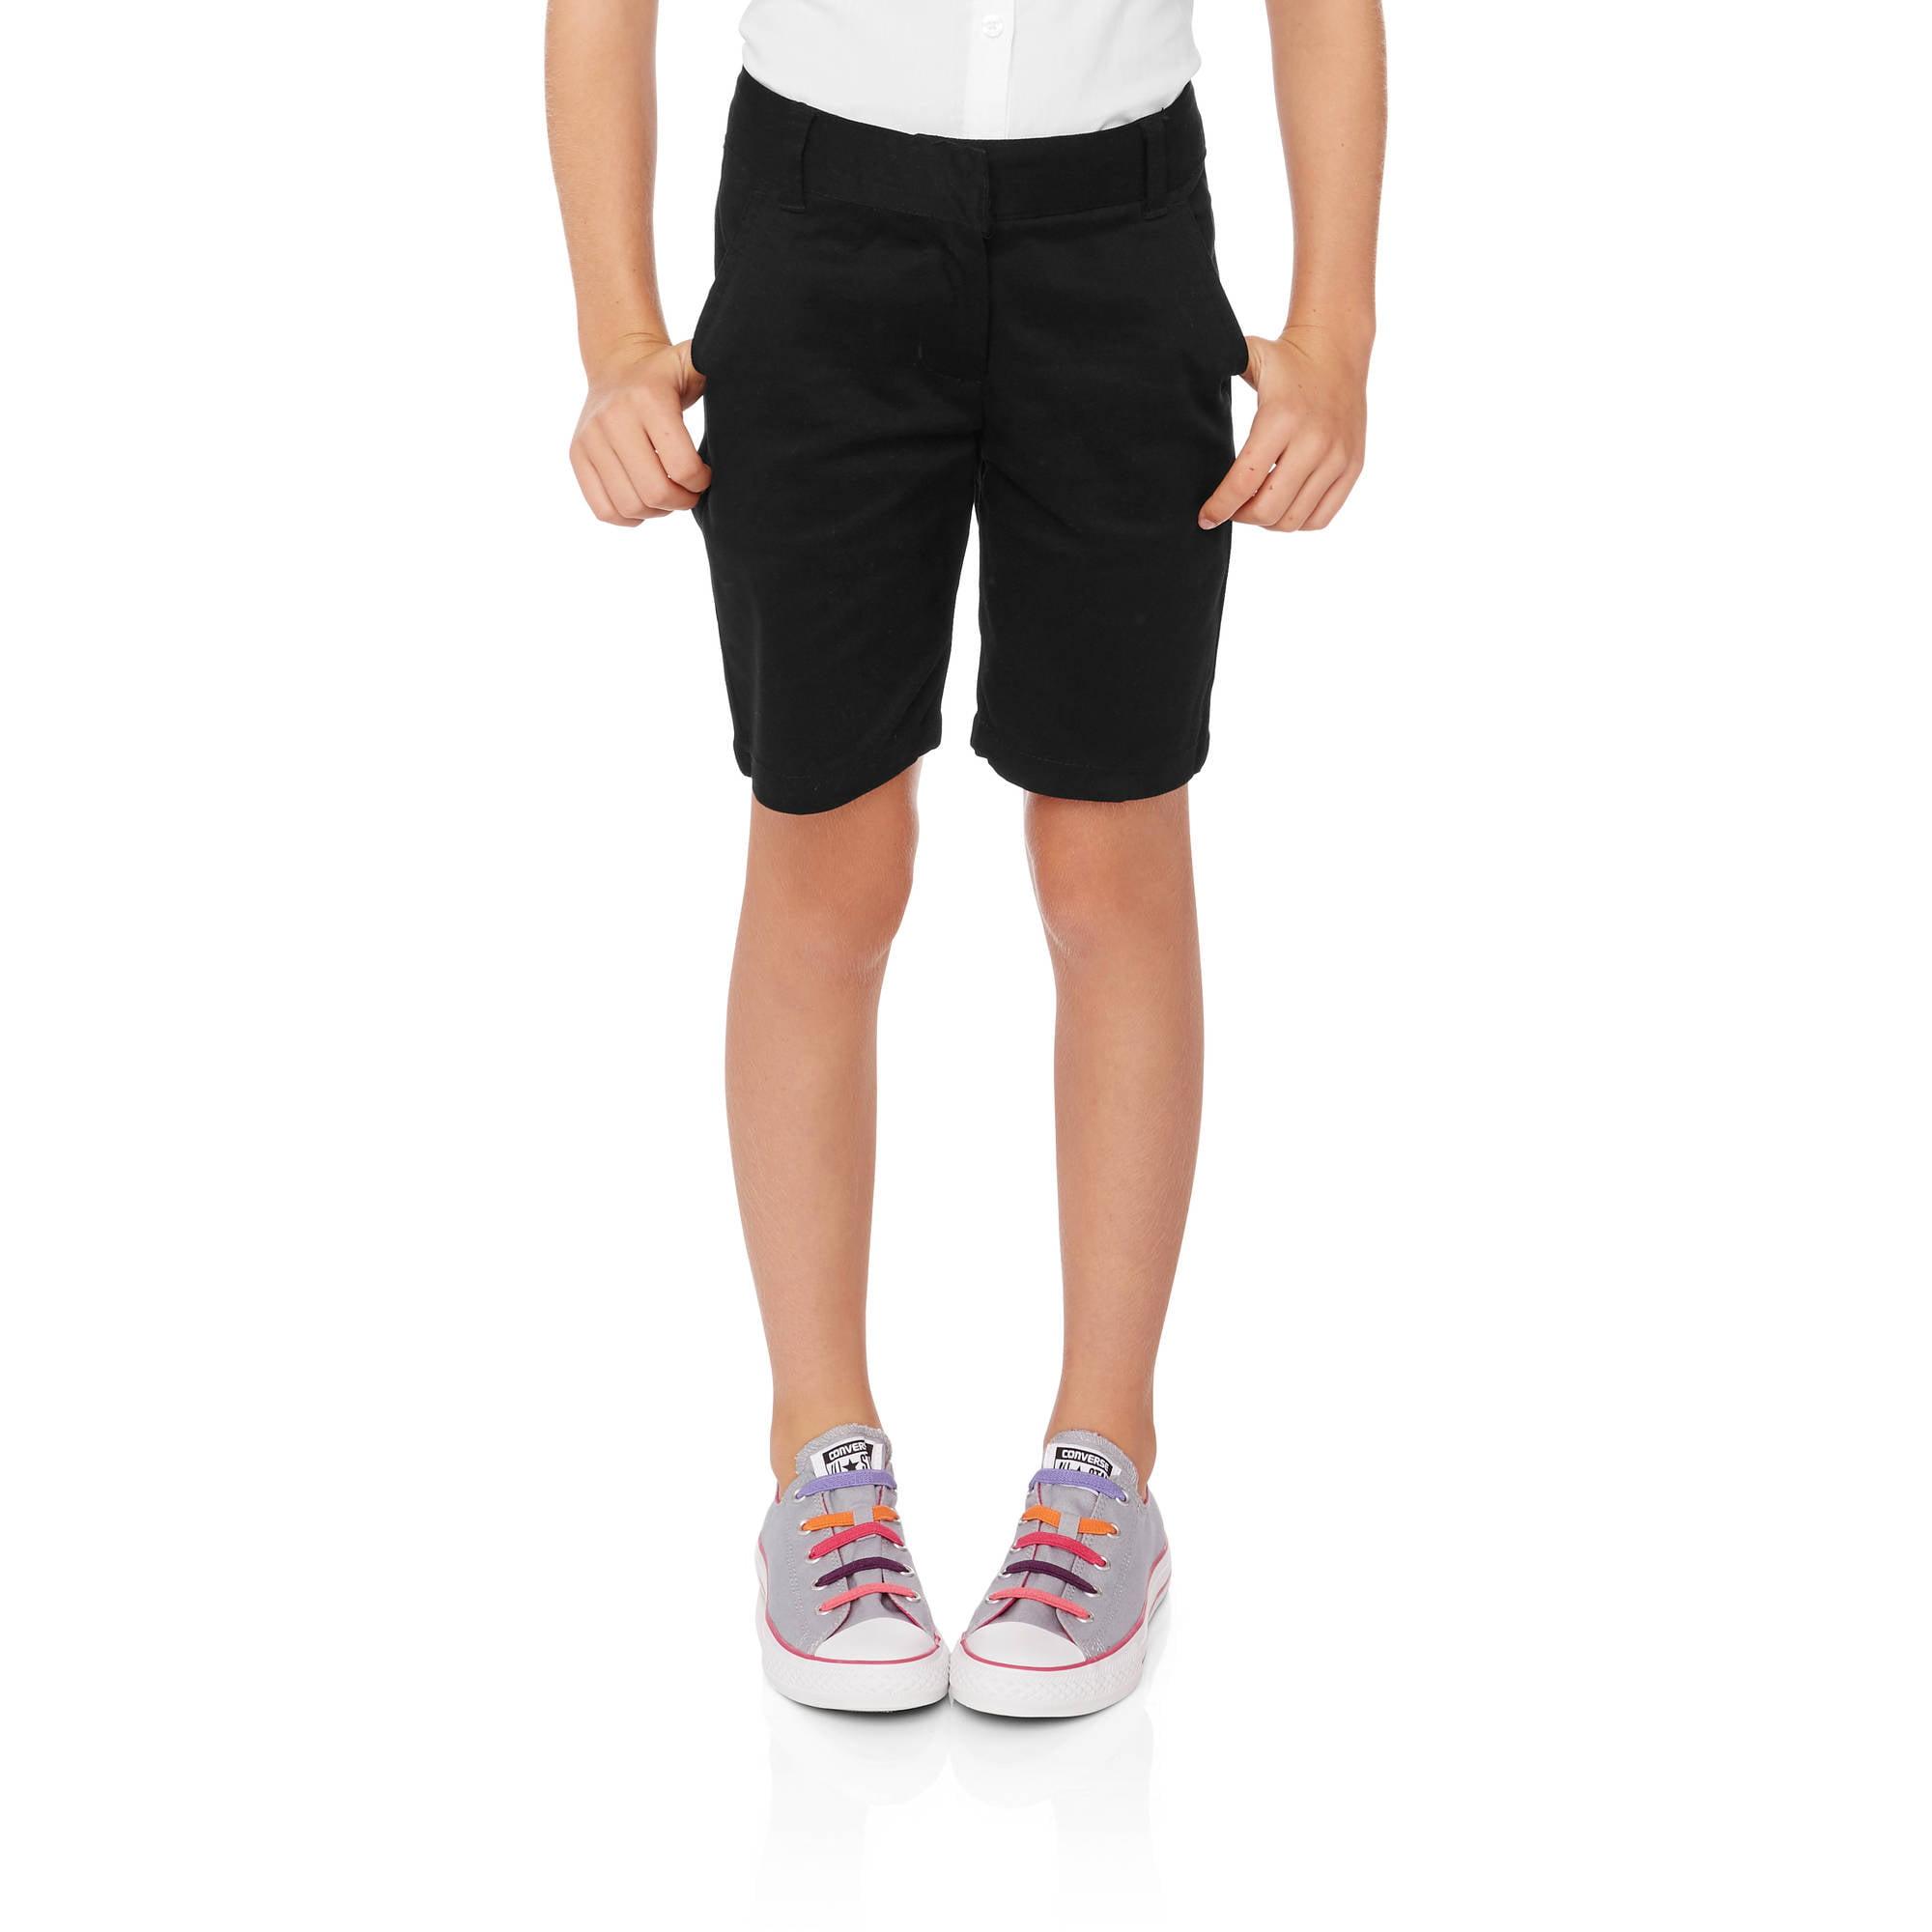 Girls Pants Khaki Black Navy Blue 6 8 10 12 16 18 NEW George school Uniform